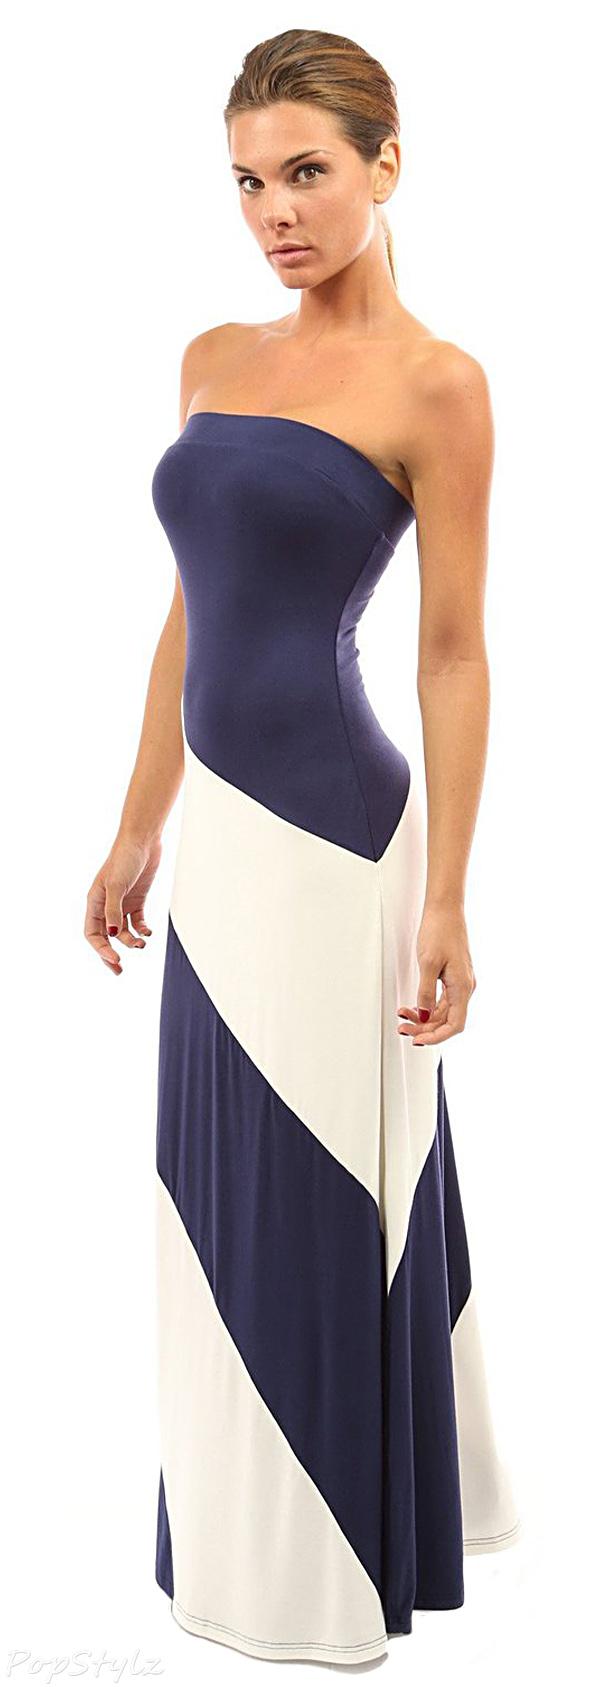 PattyBoutik Women's Striped Tube Maxi Dress